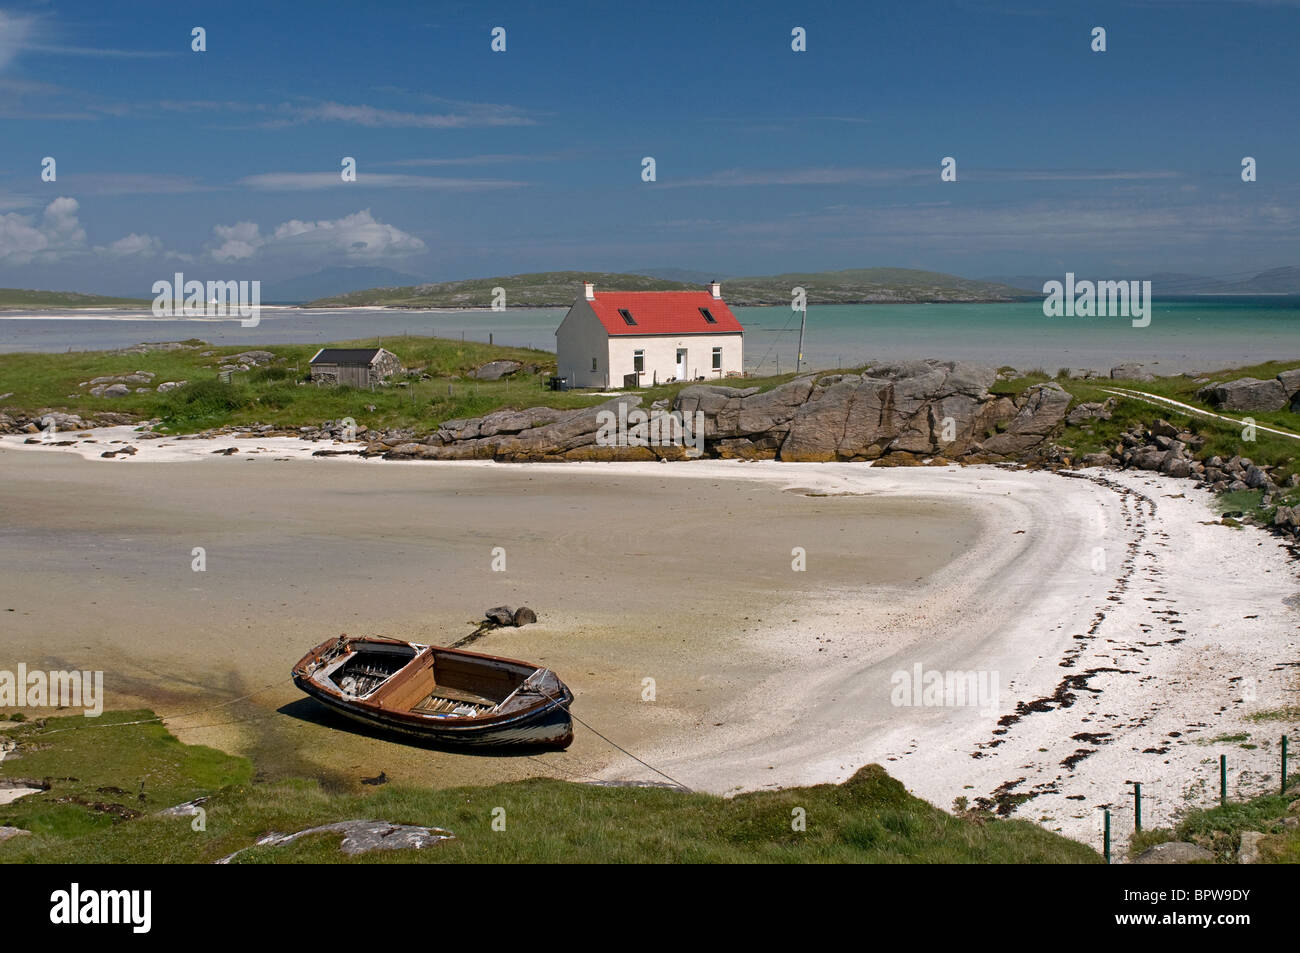 Crannag at Traig Mhor Cockleshell beach Isle of Barra, Outer Hebrides Western Isles. Scotland.  SCO 6536 - Stock Image